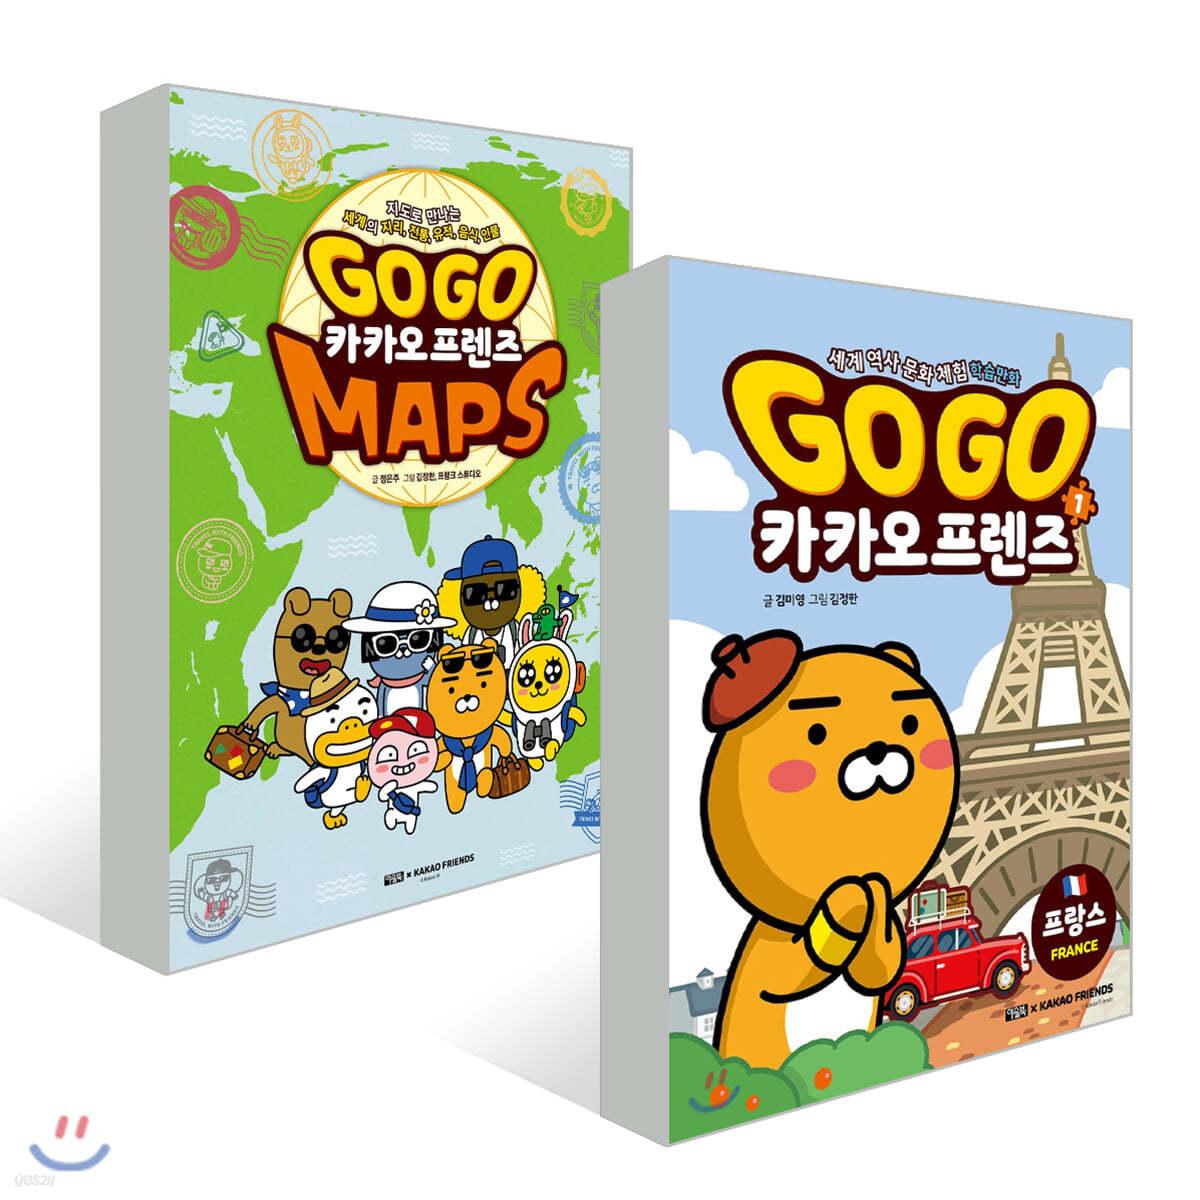 Go Go 카카오프렌즈 1 + GO GO 카카오프렌즈 MAPS 세트